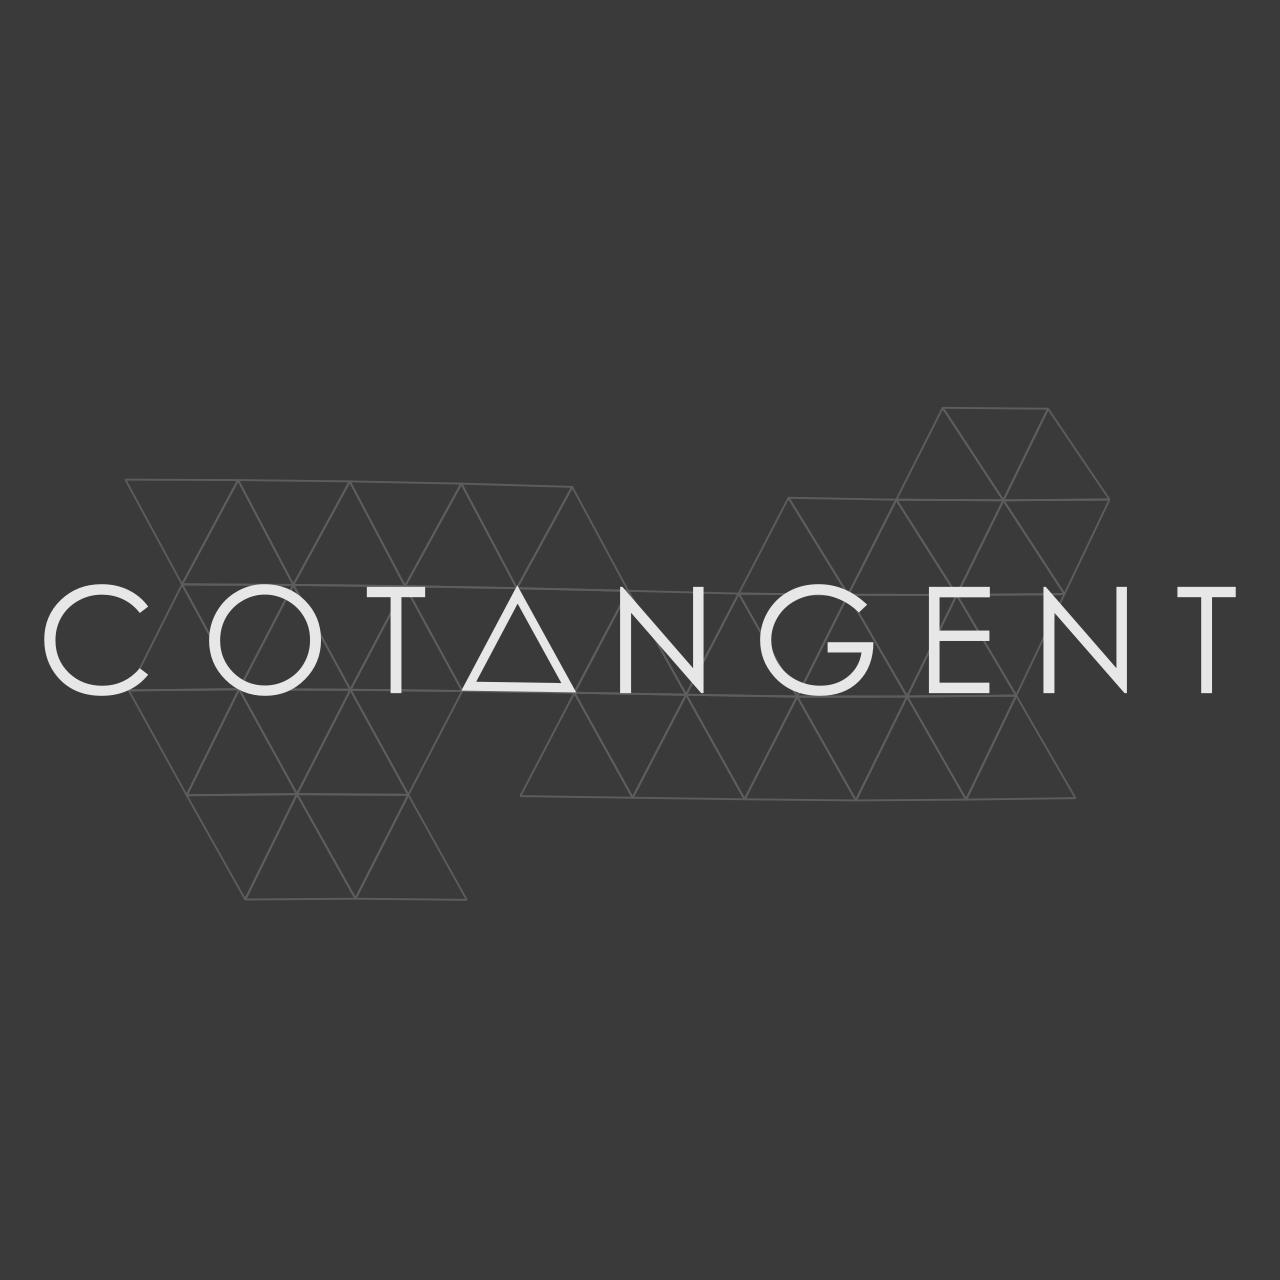 cotangent_invert_square_1280.png